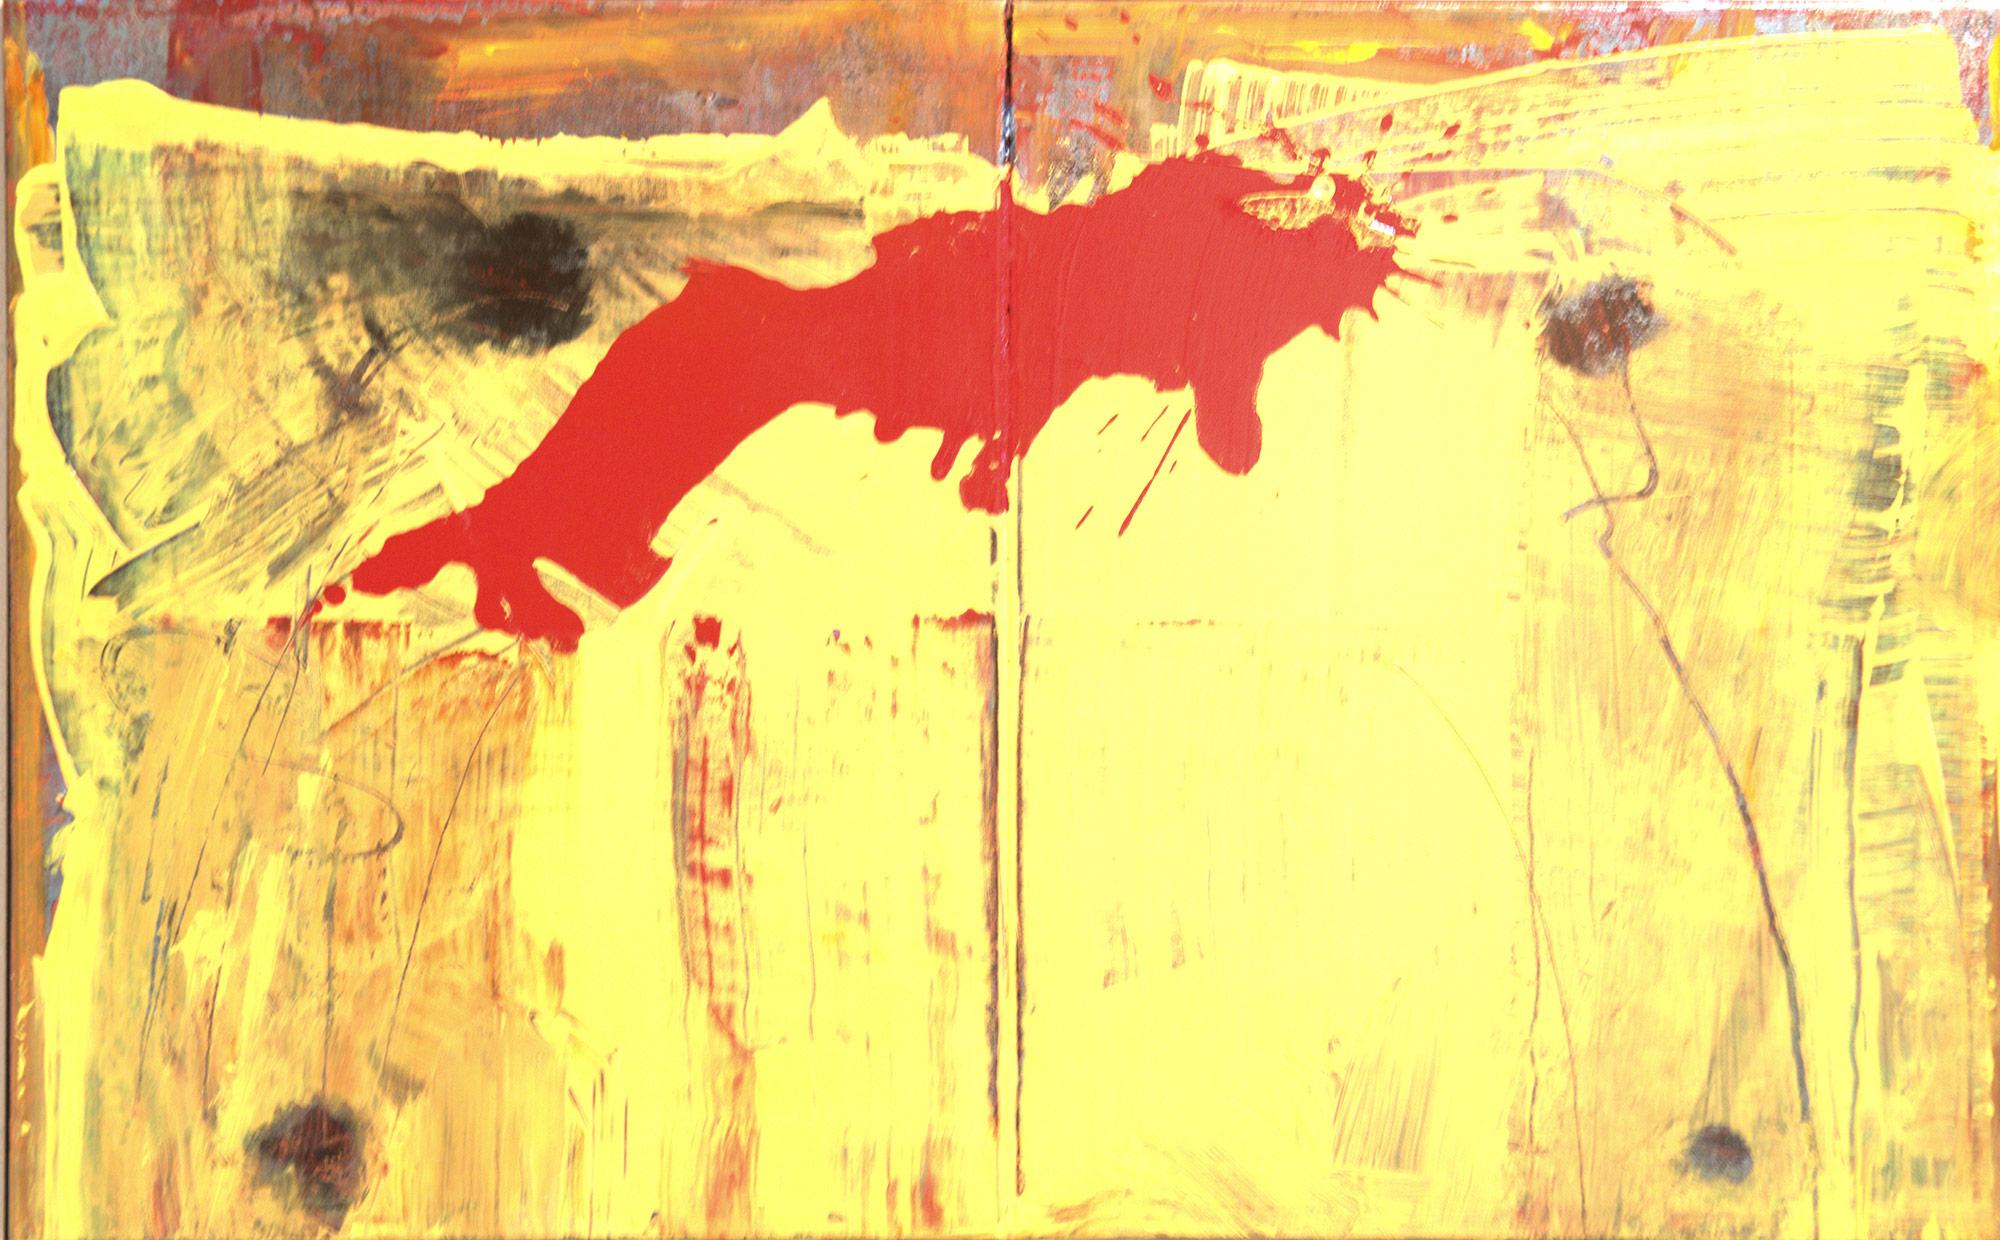 Painting by Antonio Alvarez